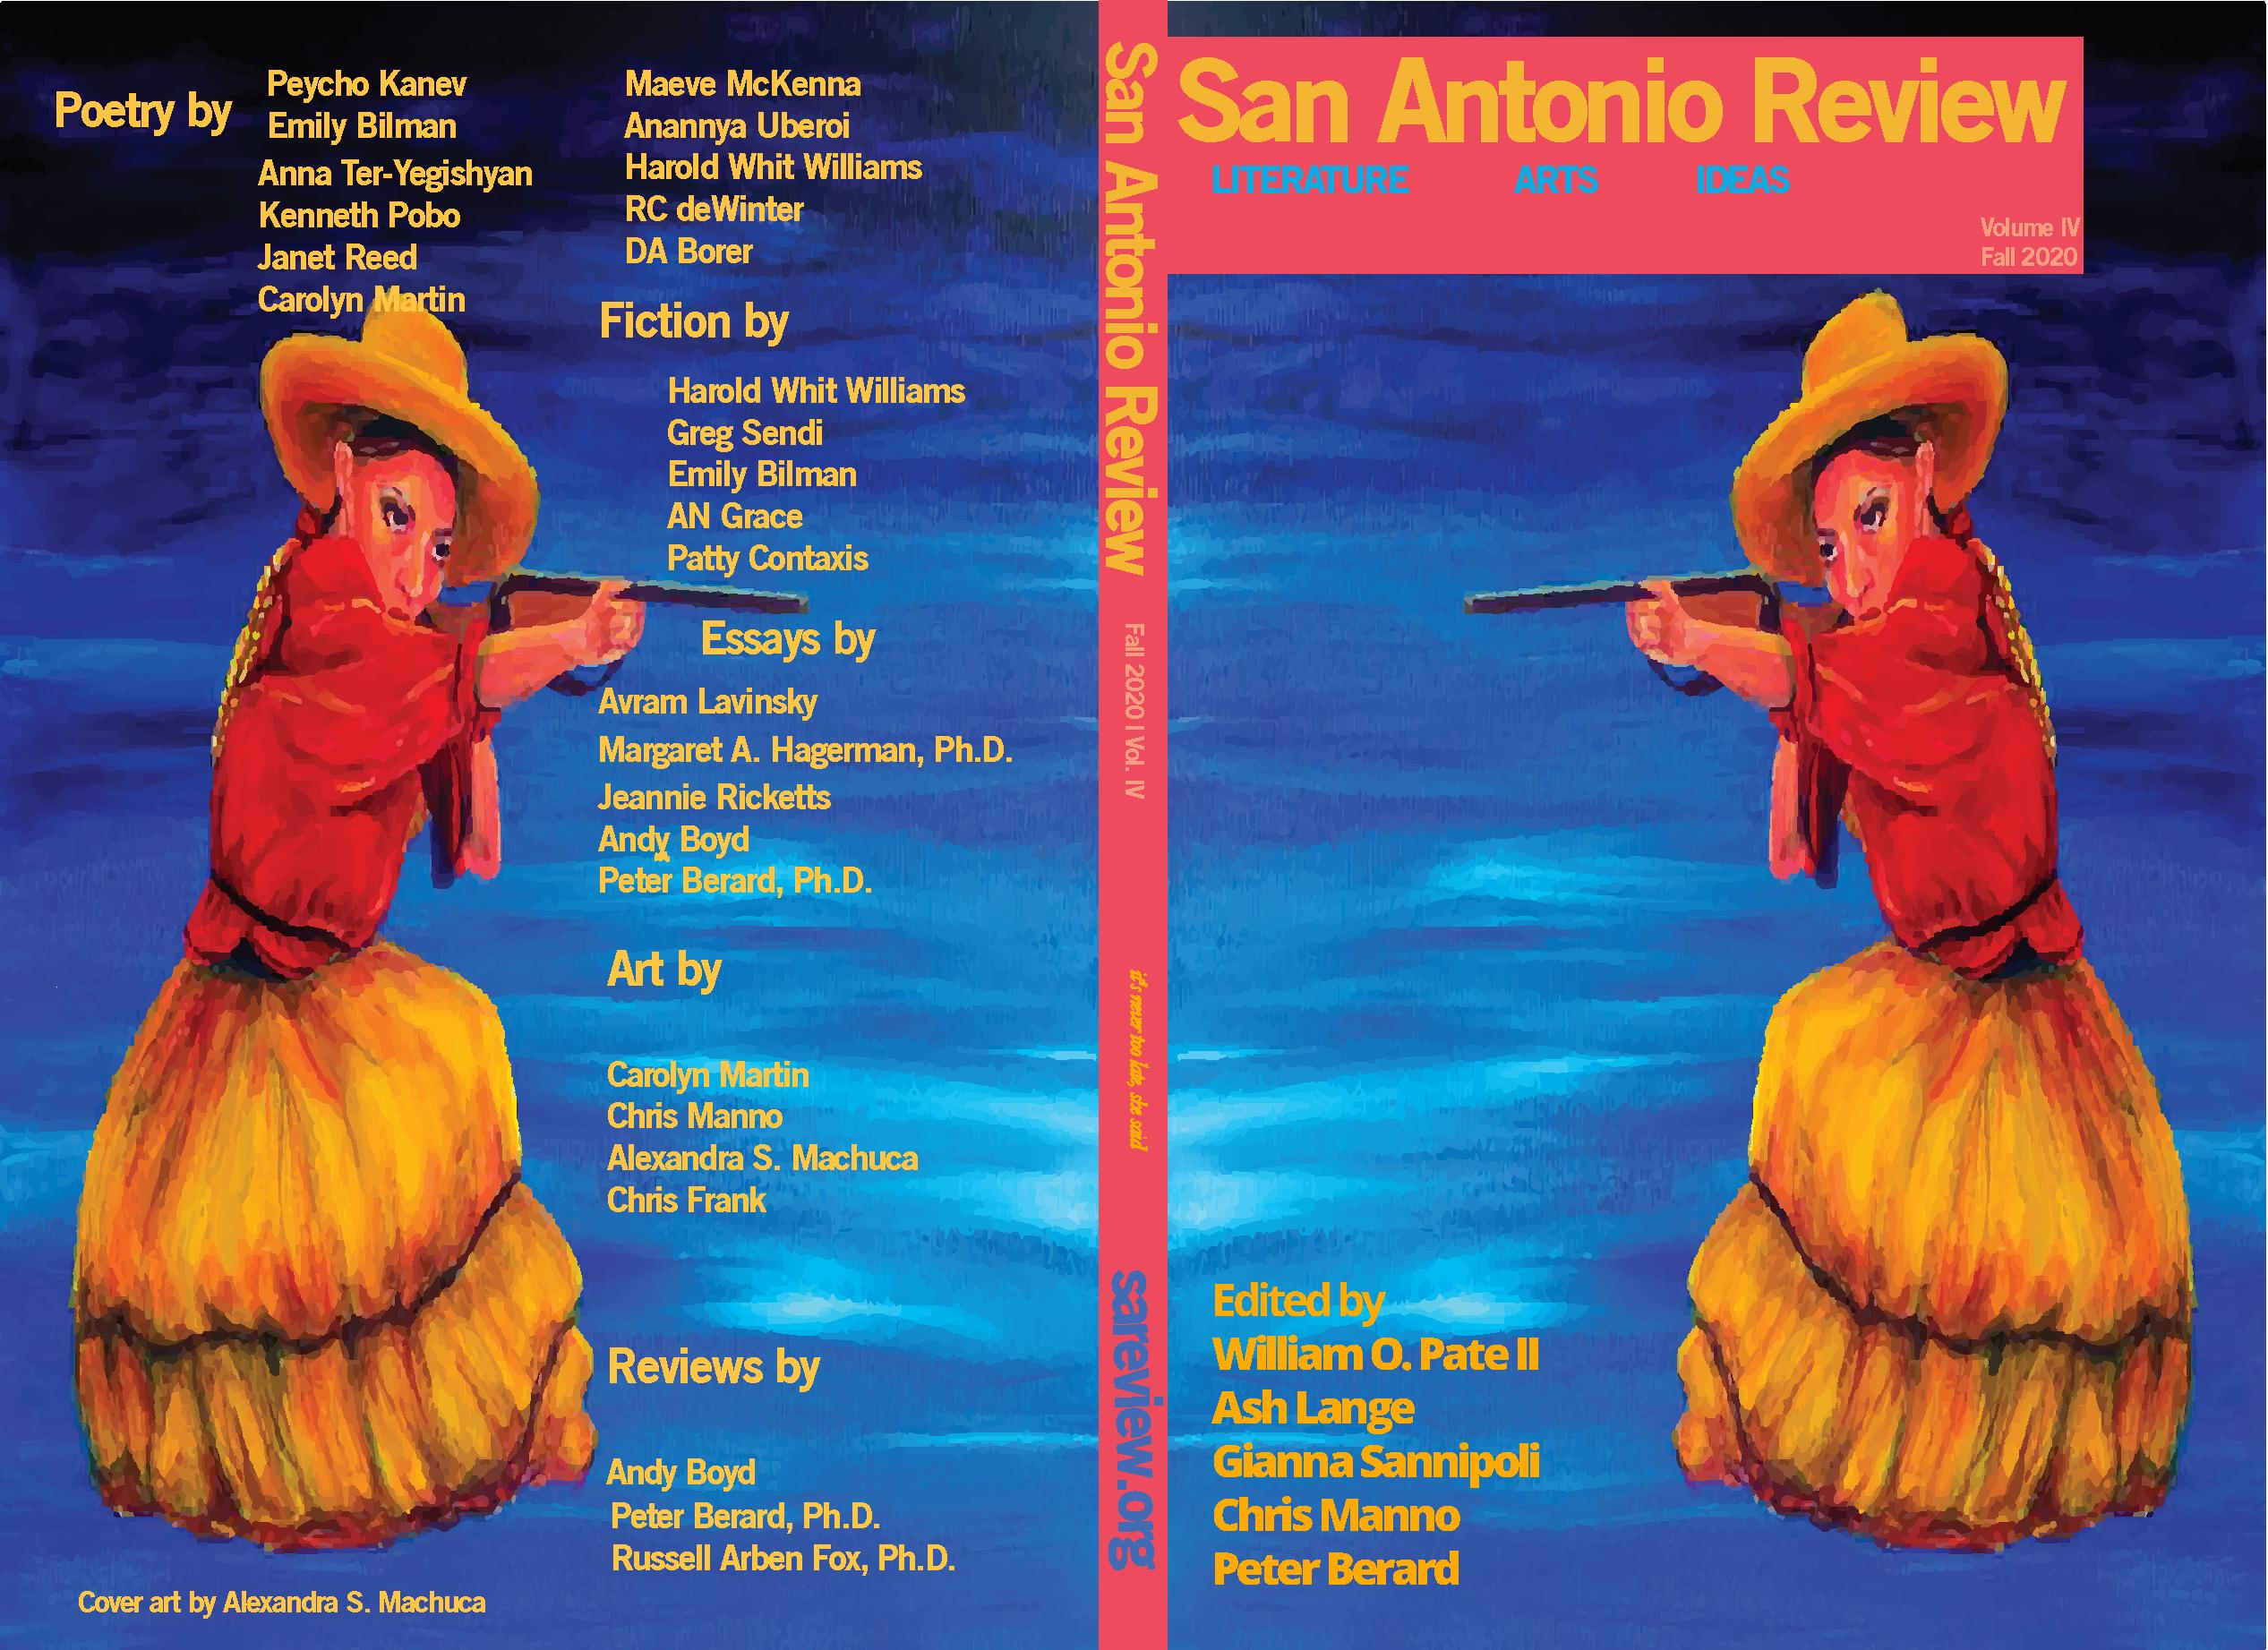 San Antonio Review (Volume IV, Fall 2020)